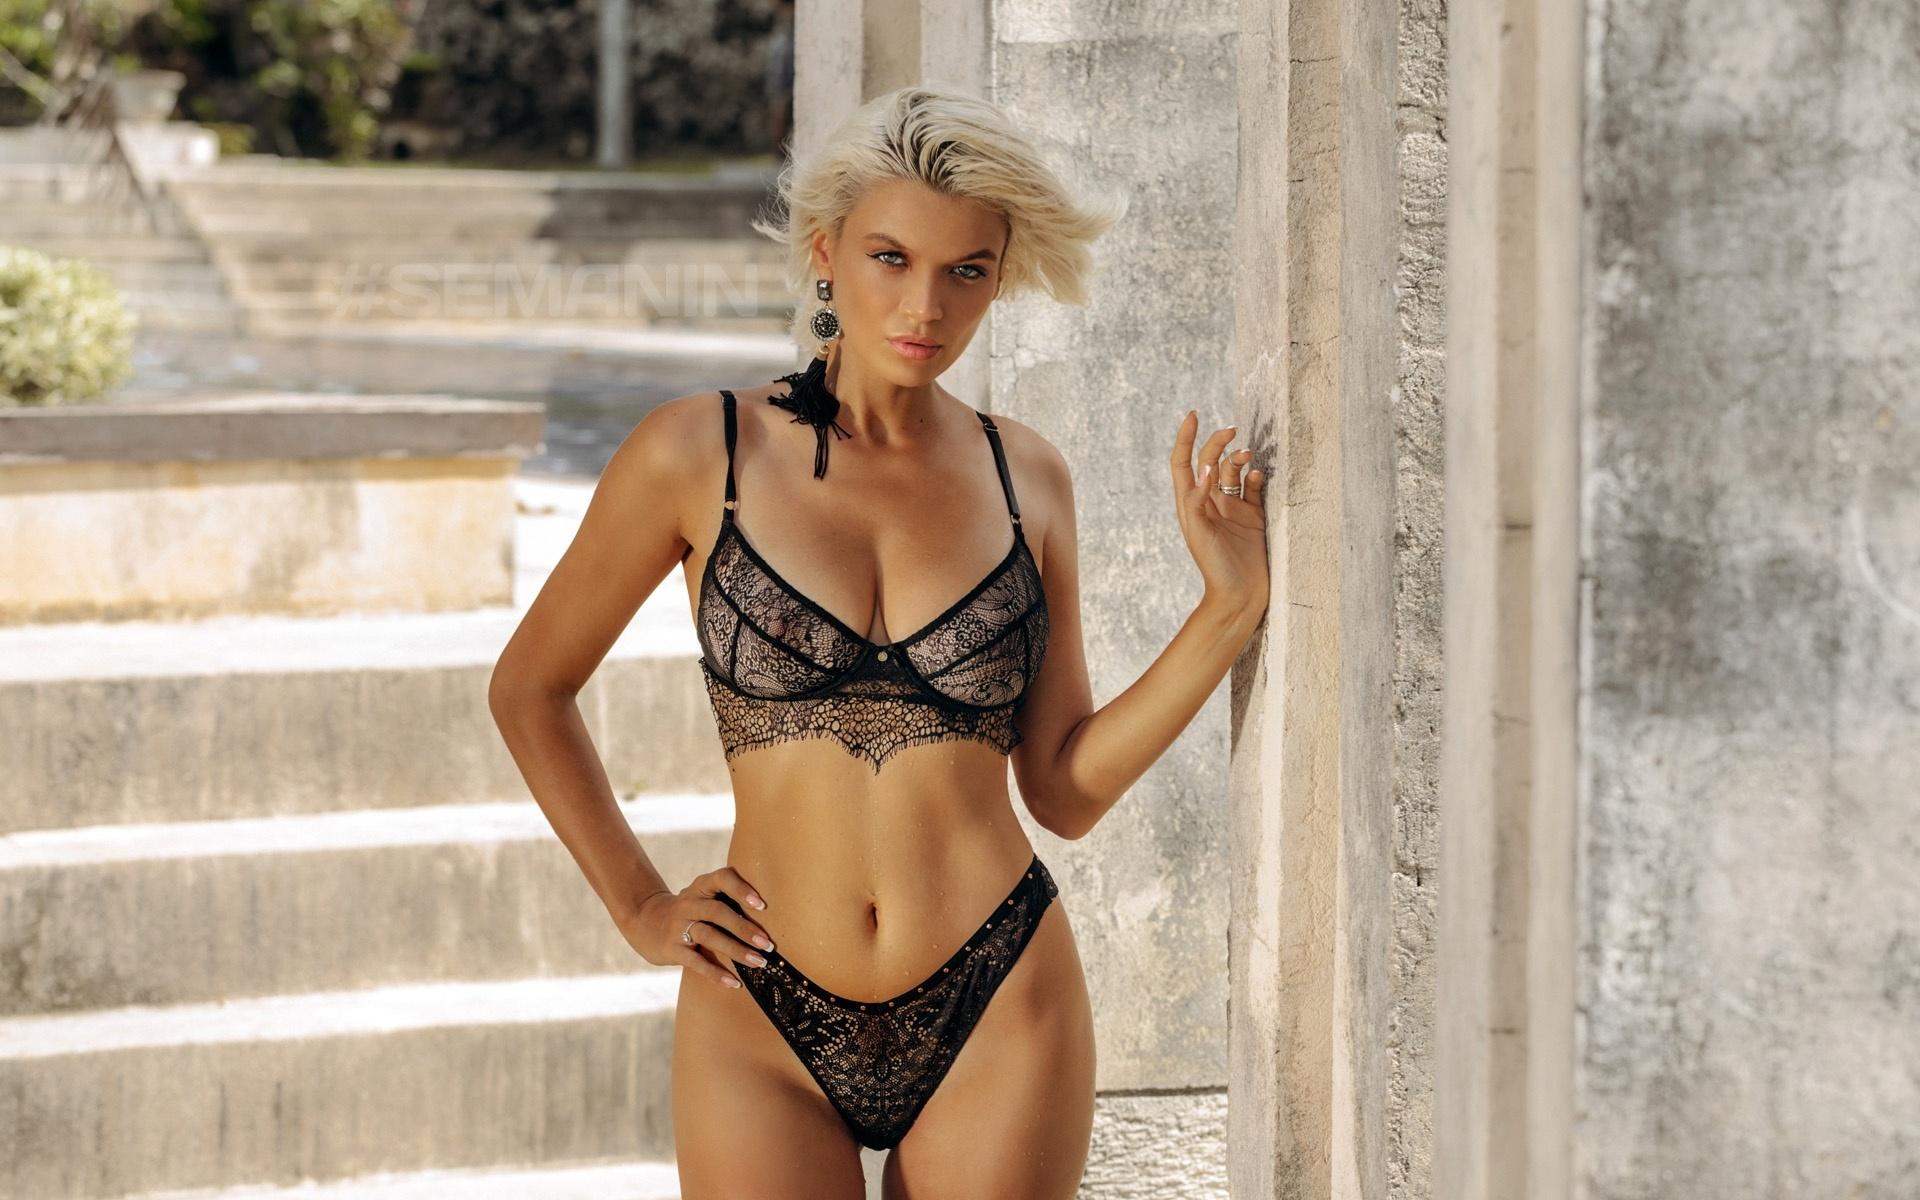 девушка, модель, поза, блондинка, александр семанин